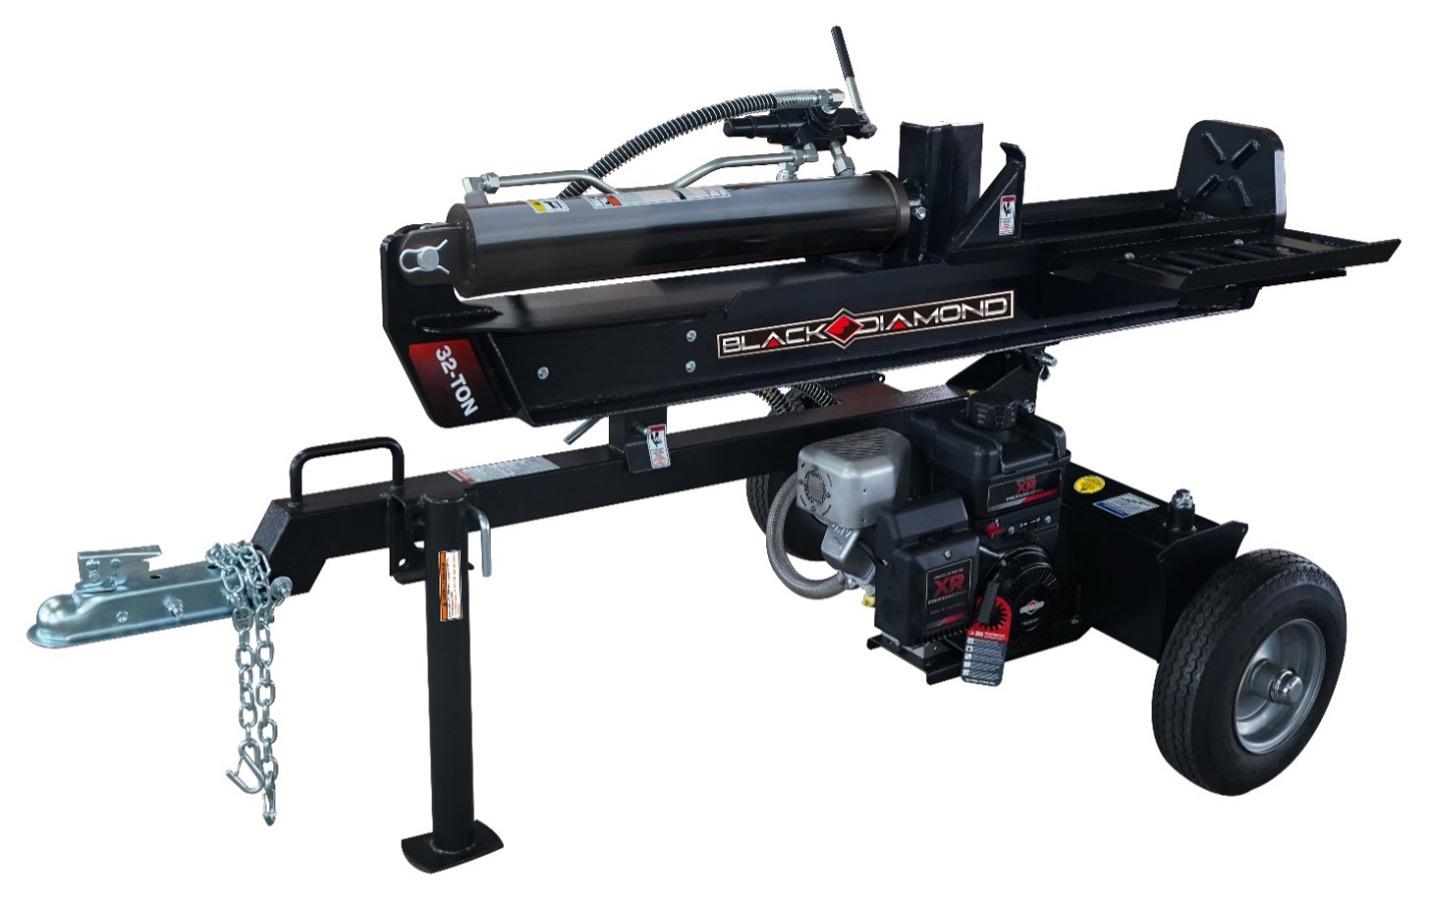 Recalled Black Diamond Log Splitter (model number BDBS32T - 32 ton)